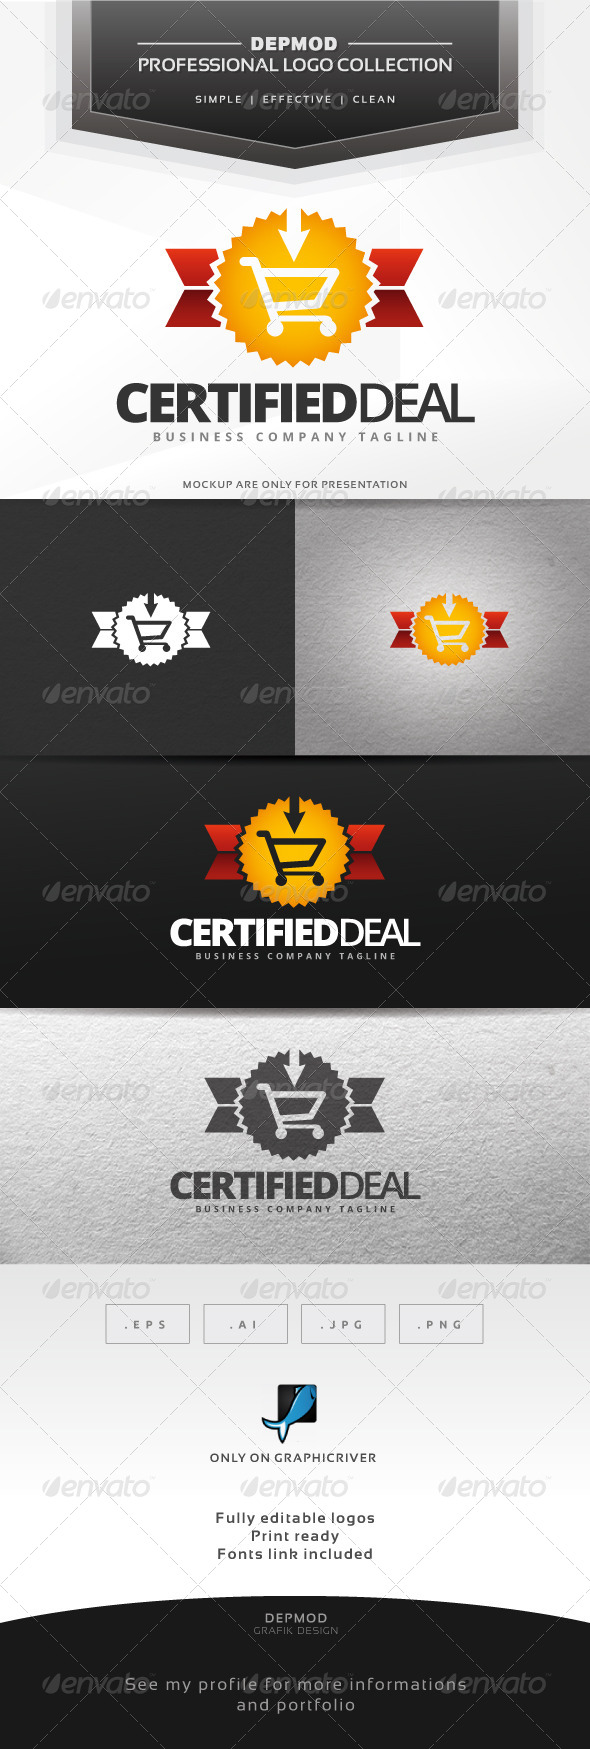 Certified Deal Logo